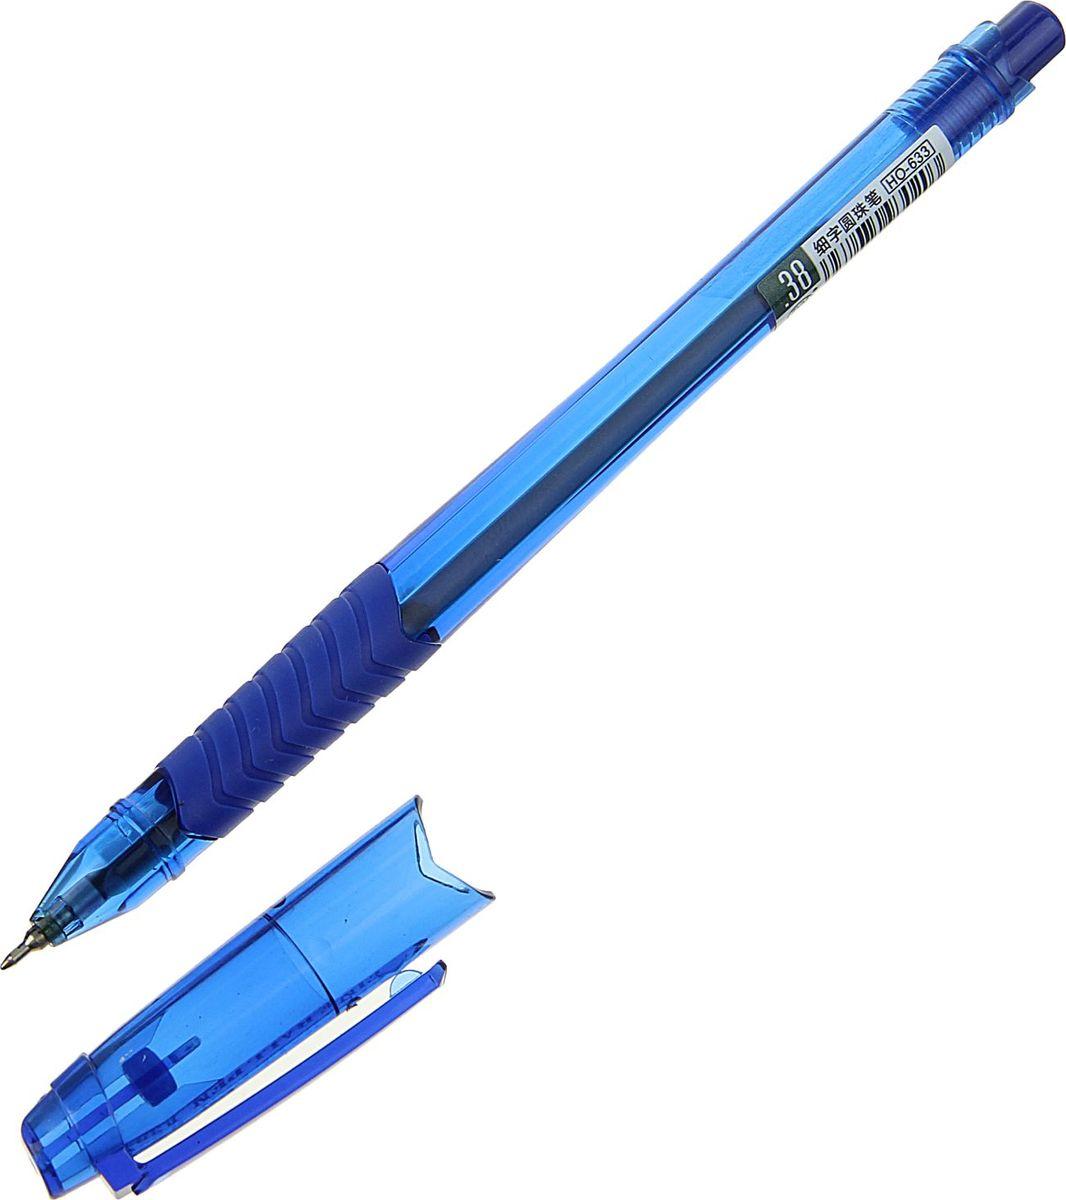 ZYM Ручка шариковая синяя 13993191399319